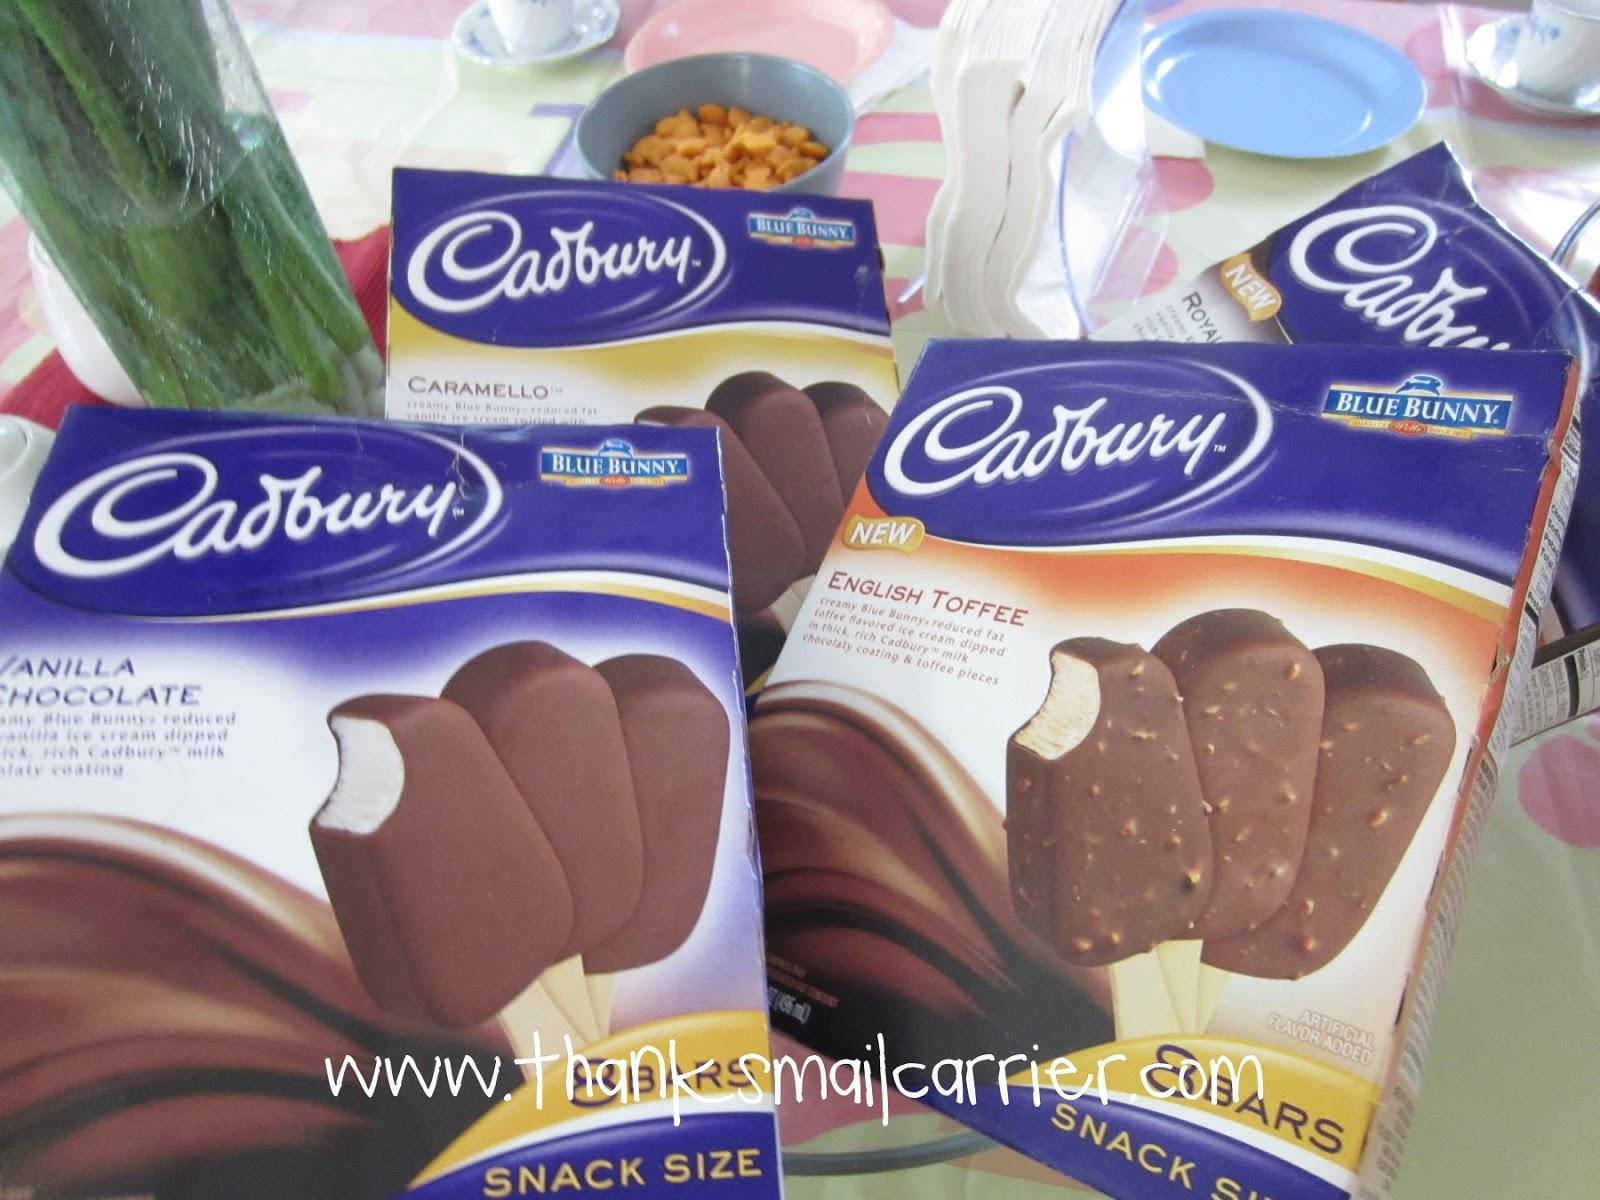 Cadbury ice cream bars